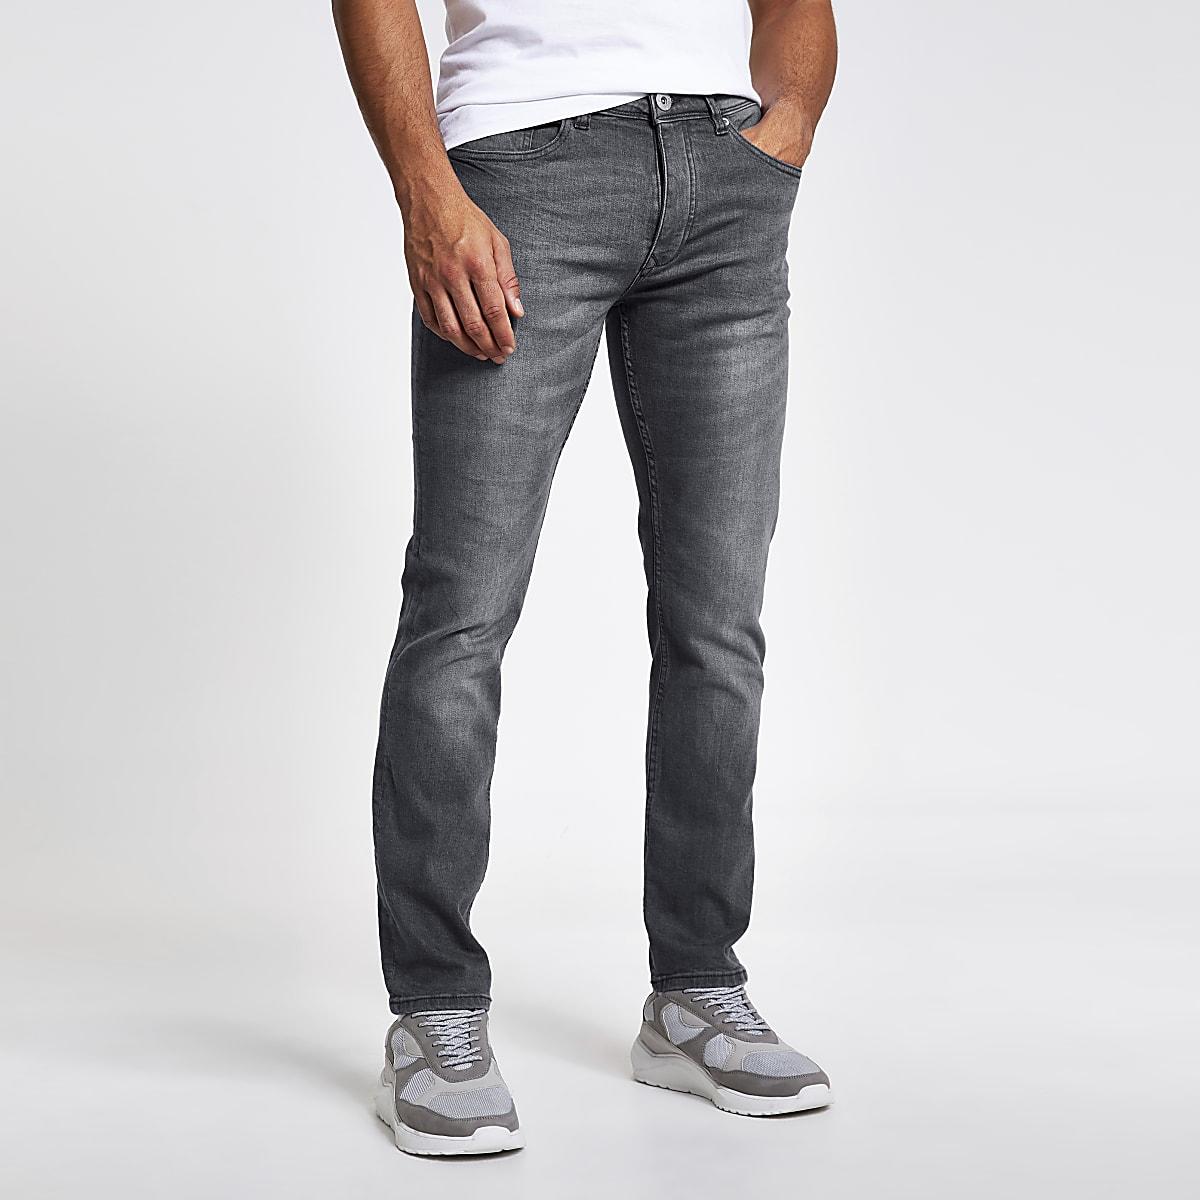 Dylan - Grijze wash slim-fit jeans met kleurverloop